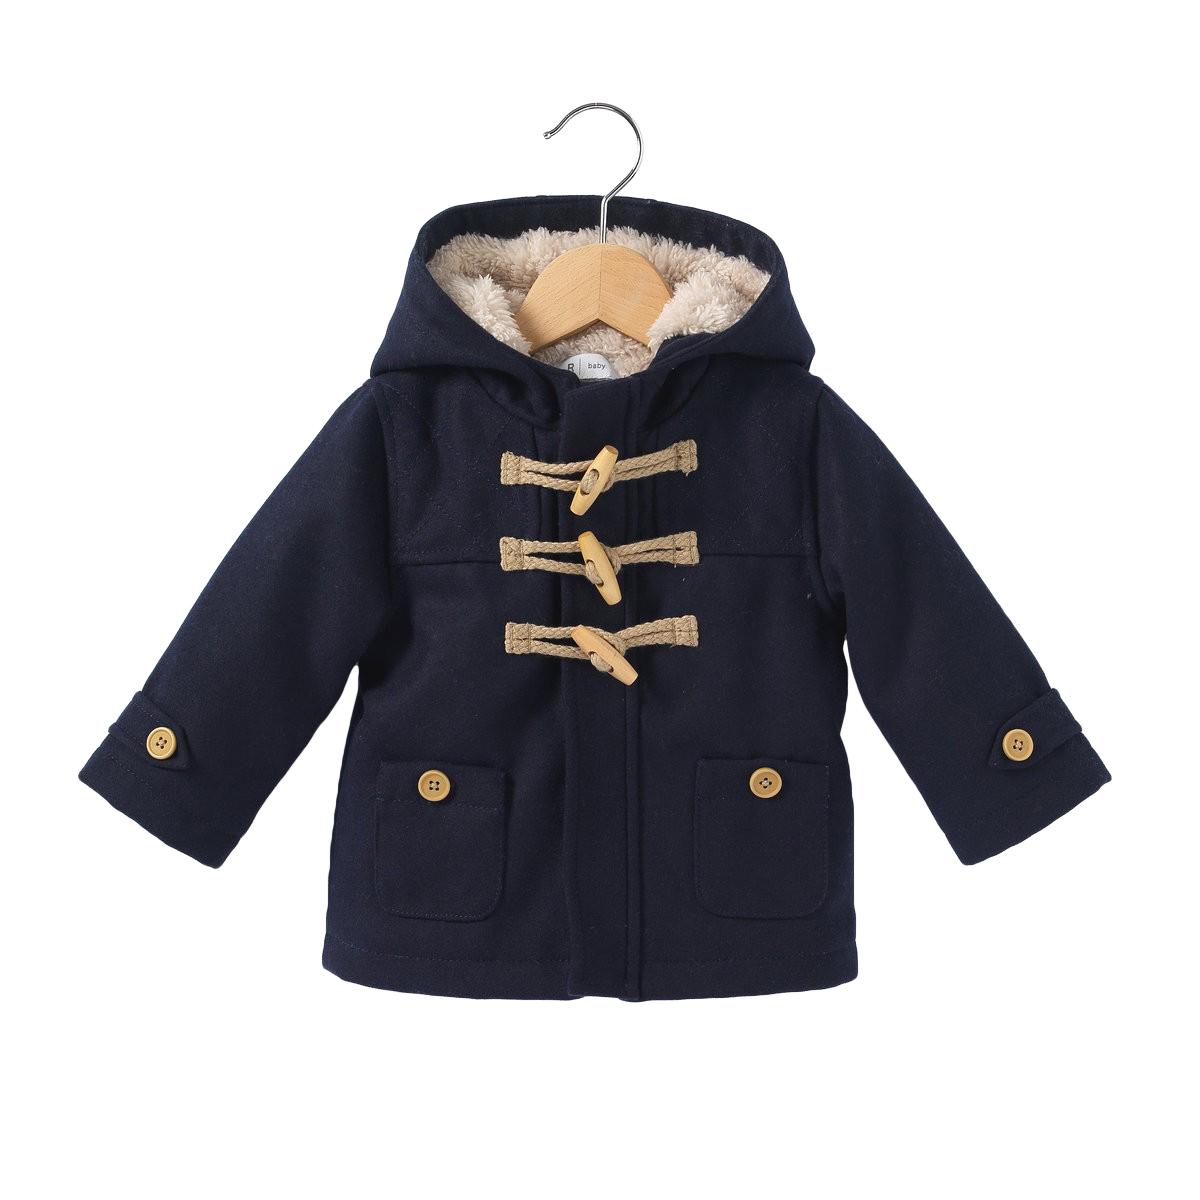 7788a1550 Boys Faux Fur Lined Duffle Coat